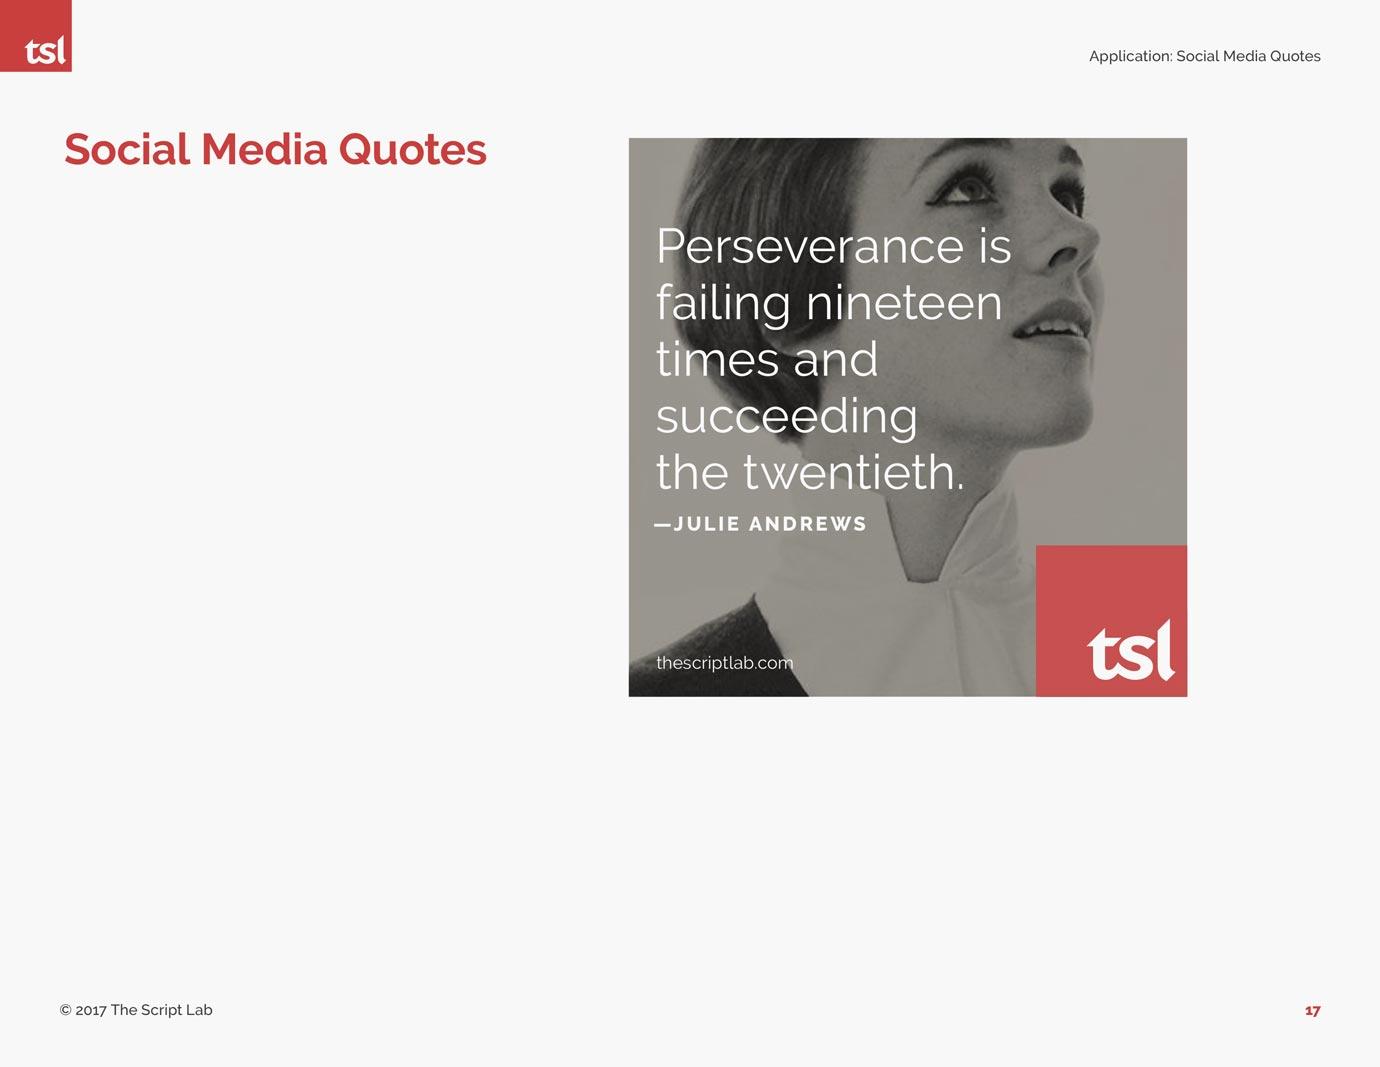 The Script Lab social media image design